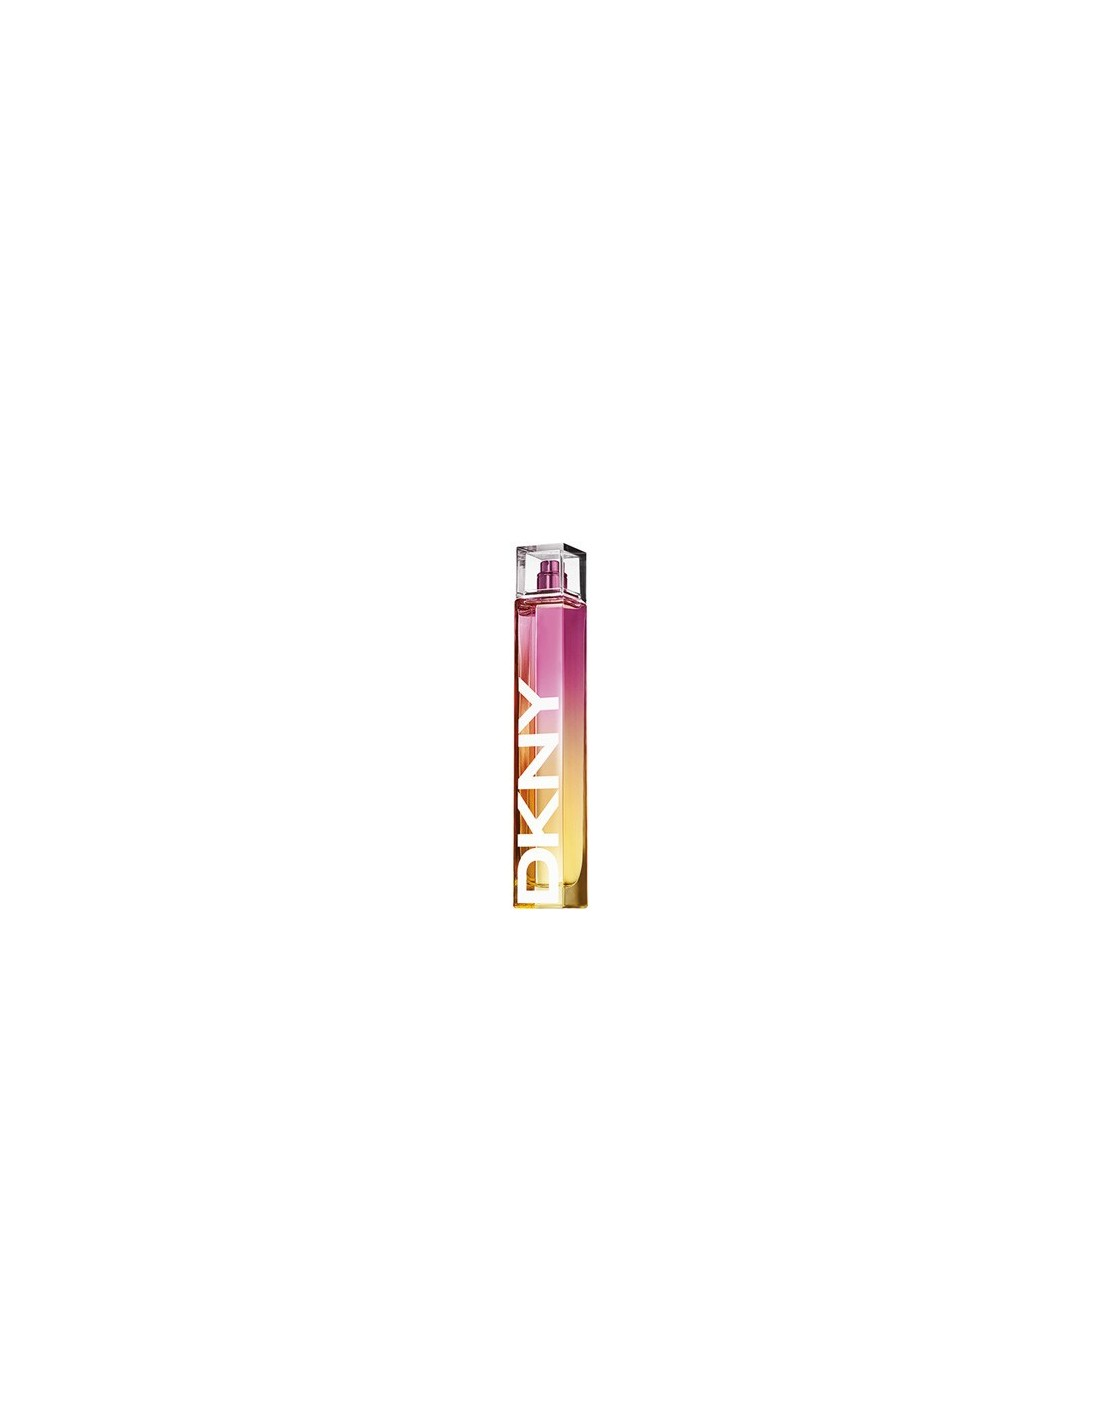 the best attitude 6f2c7 2df06 Donna Karan New York DKNY Women Summer 2015 Eau de Toilette 100 ml Spray -  TESTER